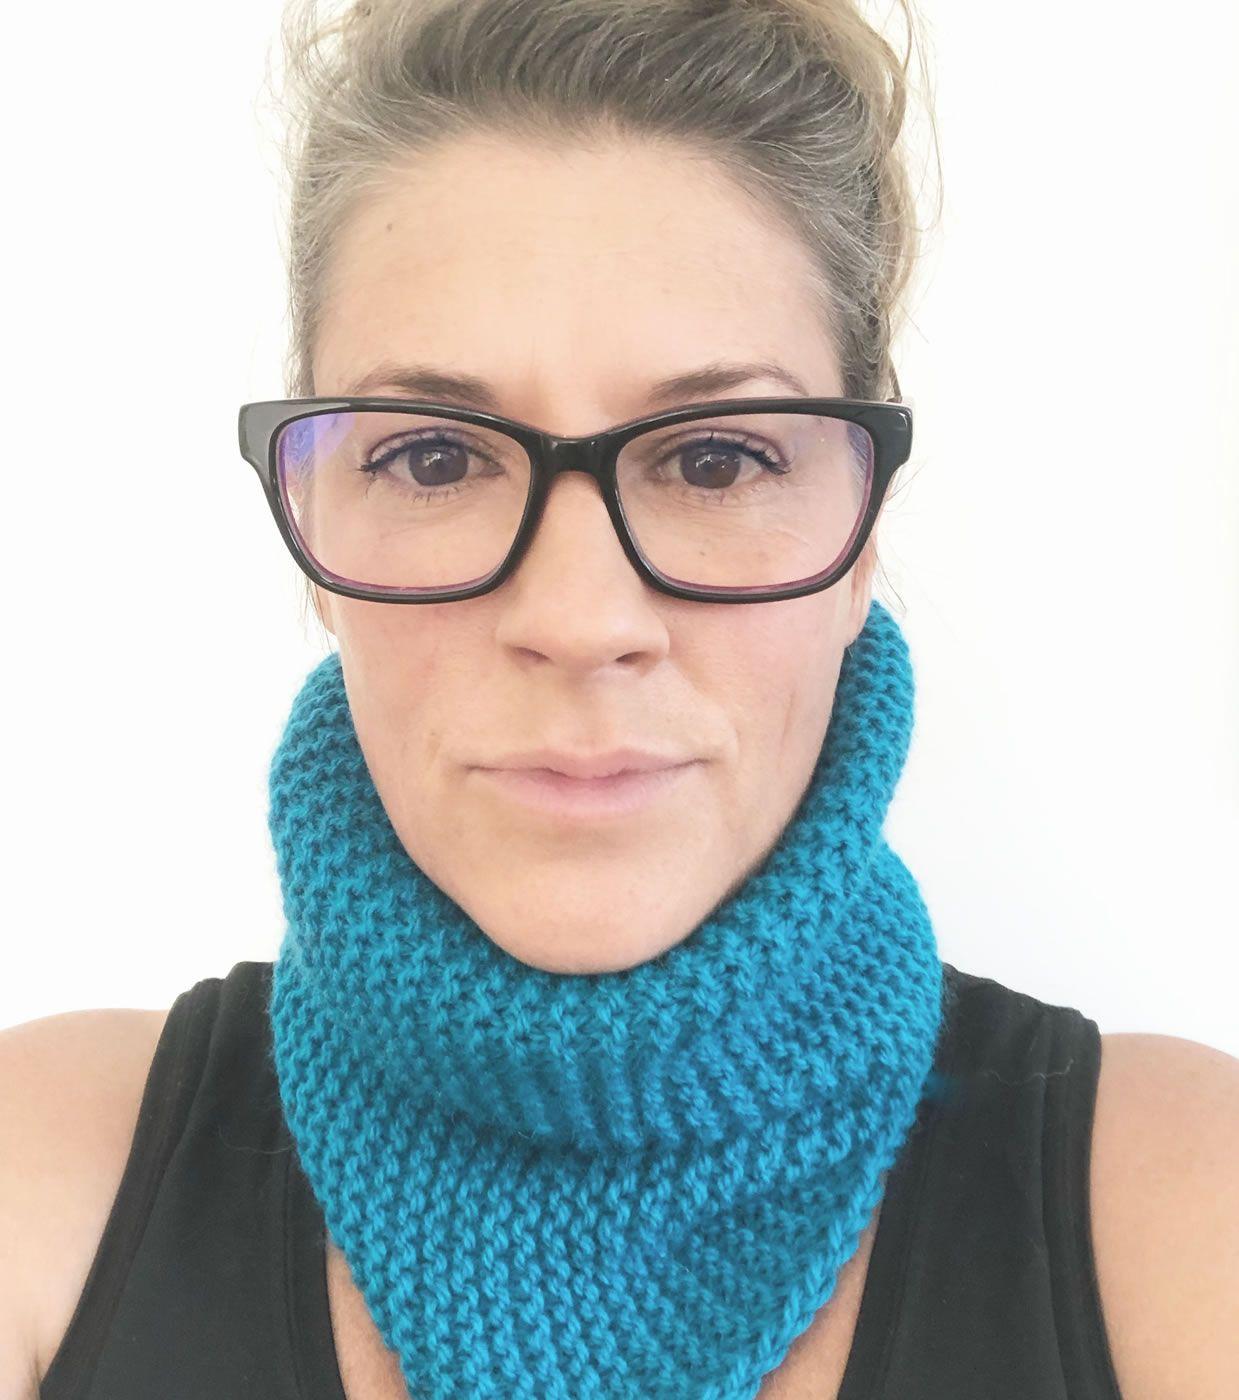 Easy (Beginner Knit) Neck Warmer Snood - Free Knitting ...